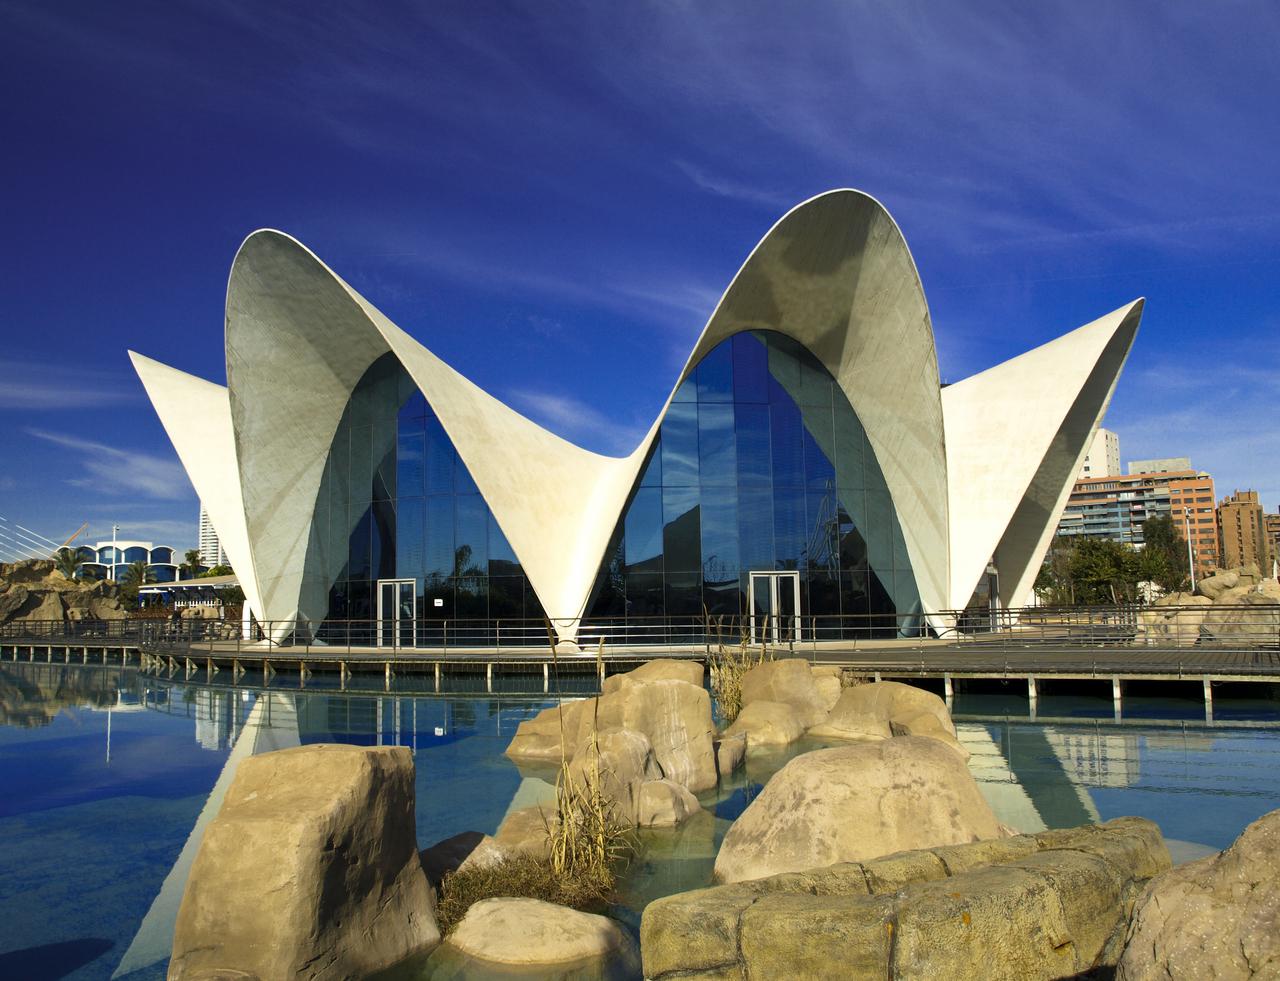 #254BA6 Inova Vidros: Vidro & Arquitetura Obras Incríveis 1580 Vidros Janelas Fortaleza